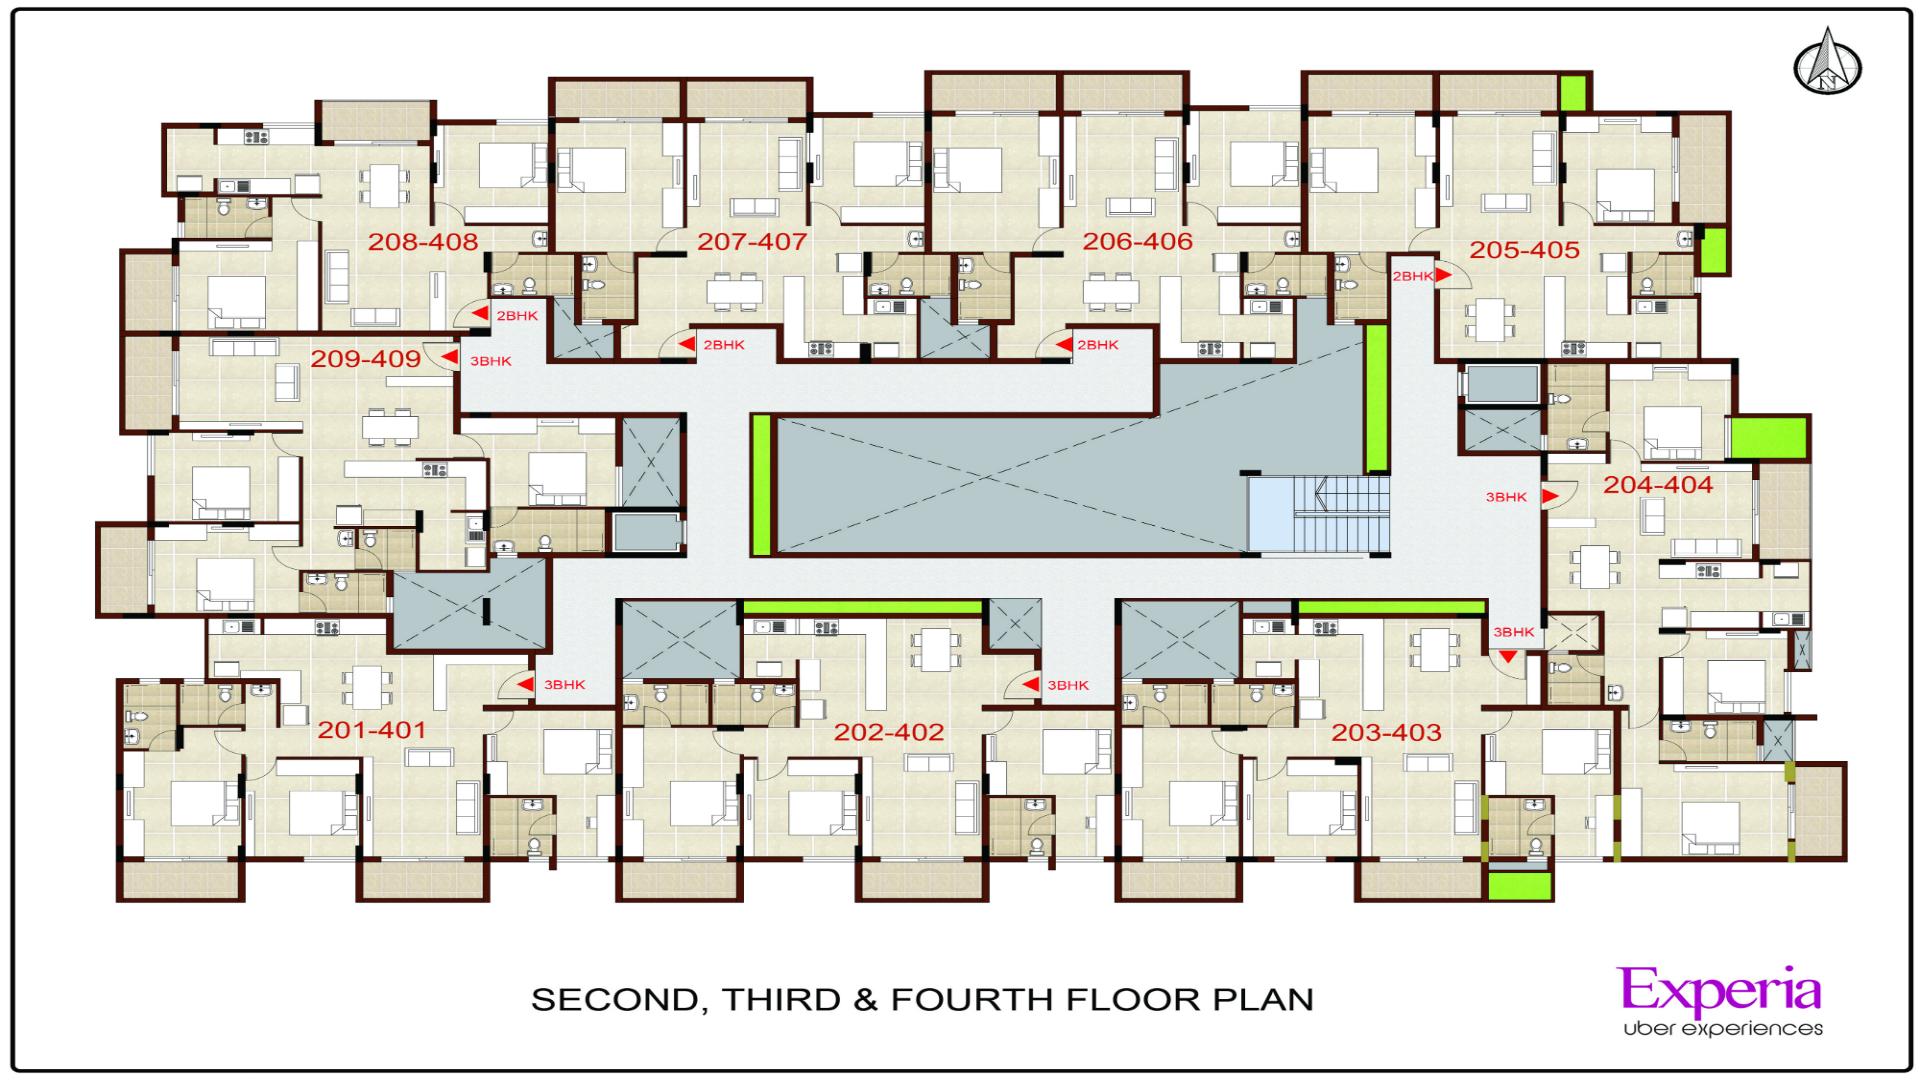 Jp Plan axis experia jp nagar 8th phase bengaluru ambara estates